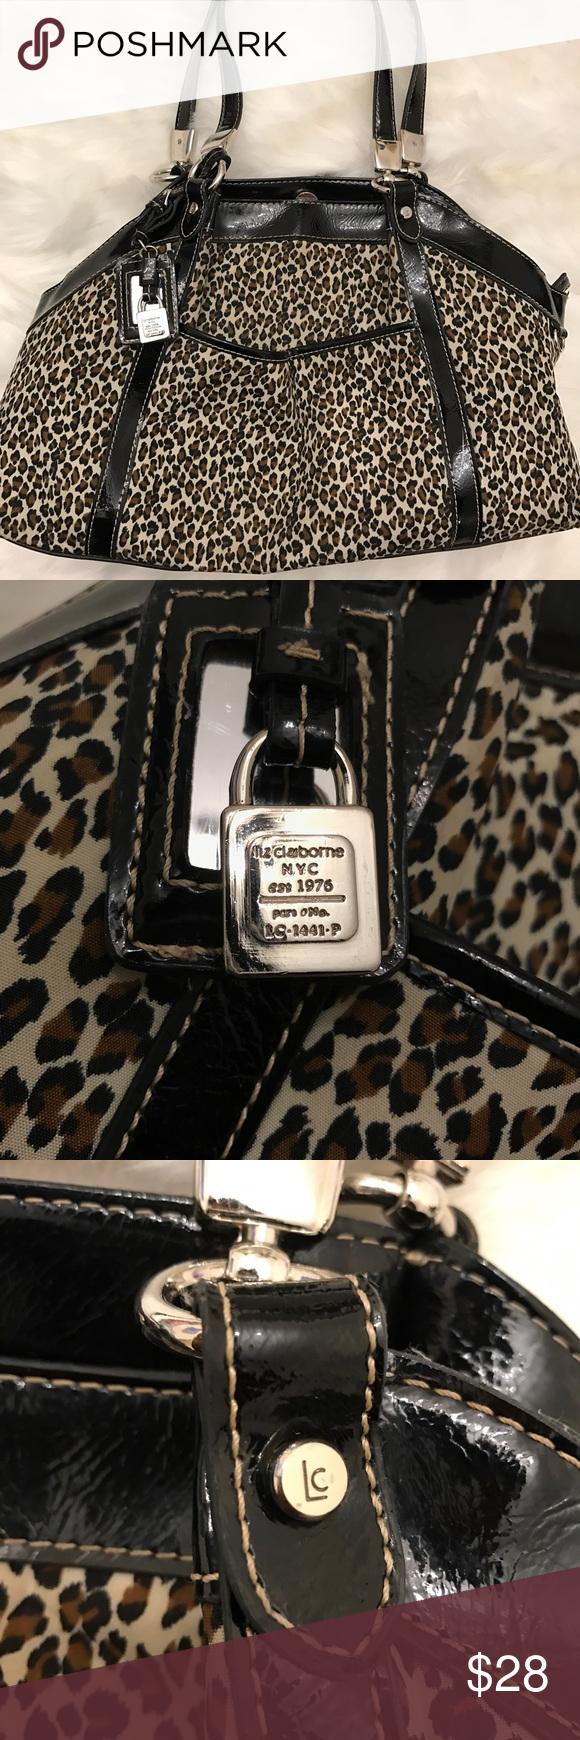 Liz Claiborne Shoulder Bag Leopard Print -like new Pre-owned but in good condition. Liz Claiborne Shoulder Bag. Leopard print. Black lining. Three compartments plus plenty of pockets. Liz Claiborne Bags Shoulder Bags